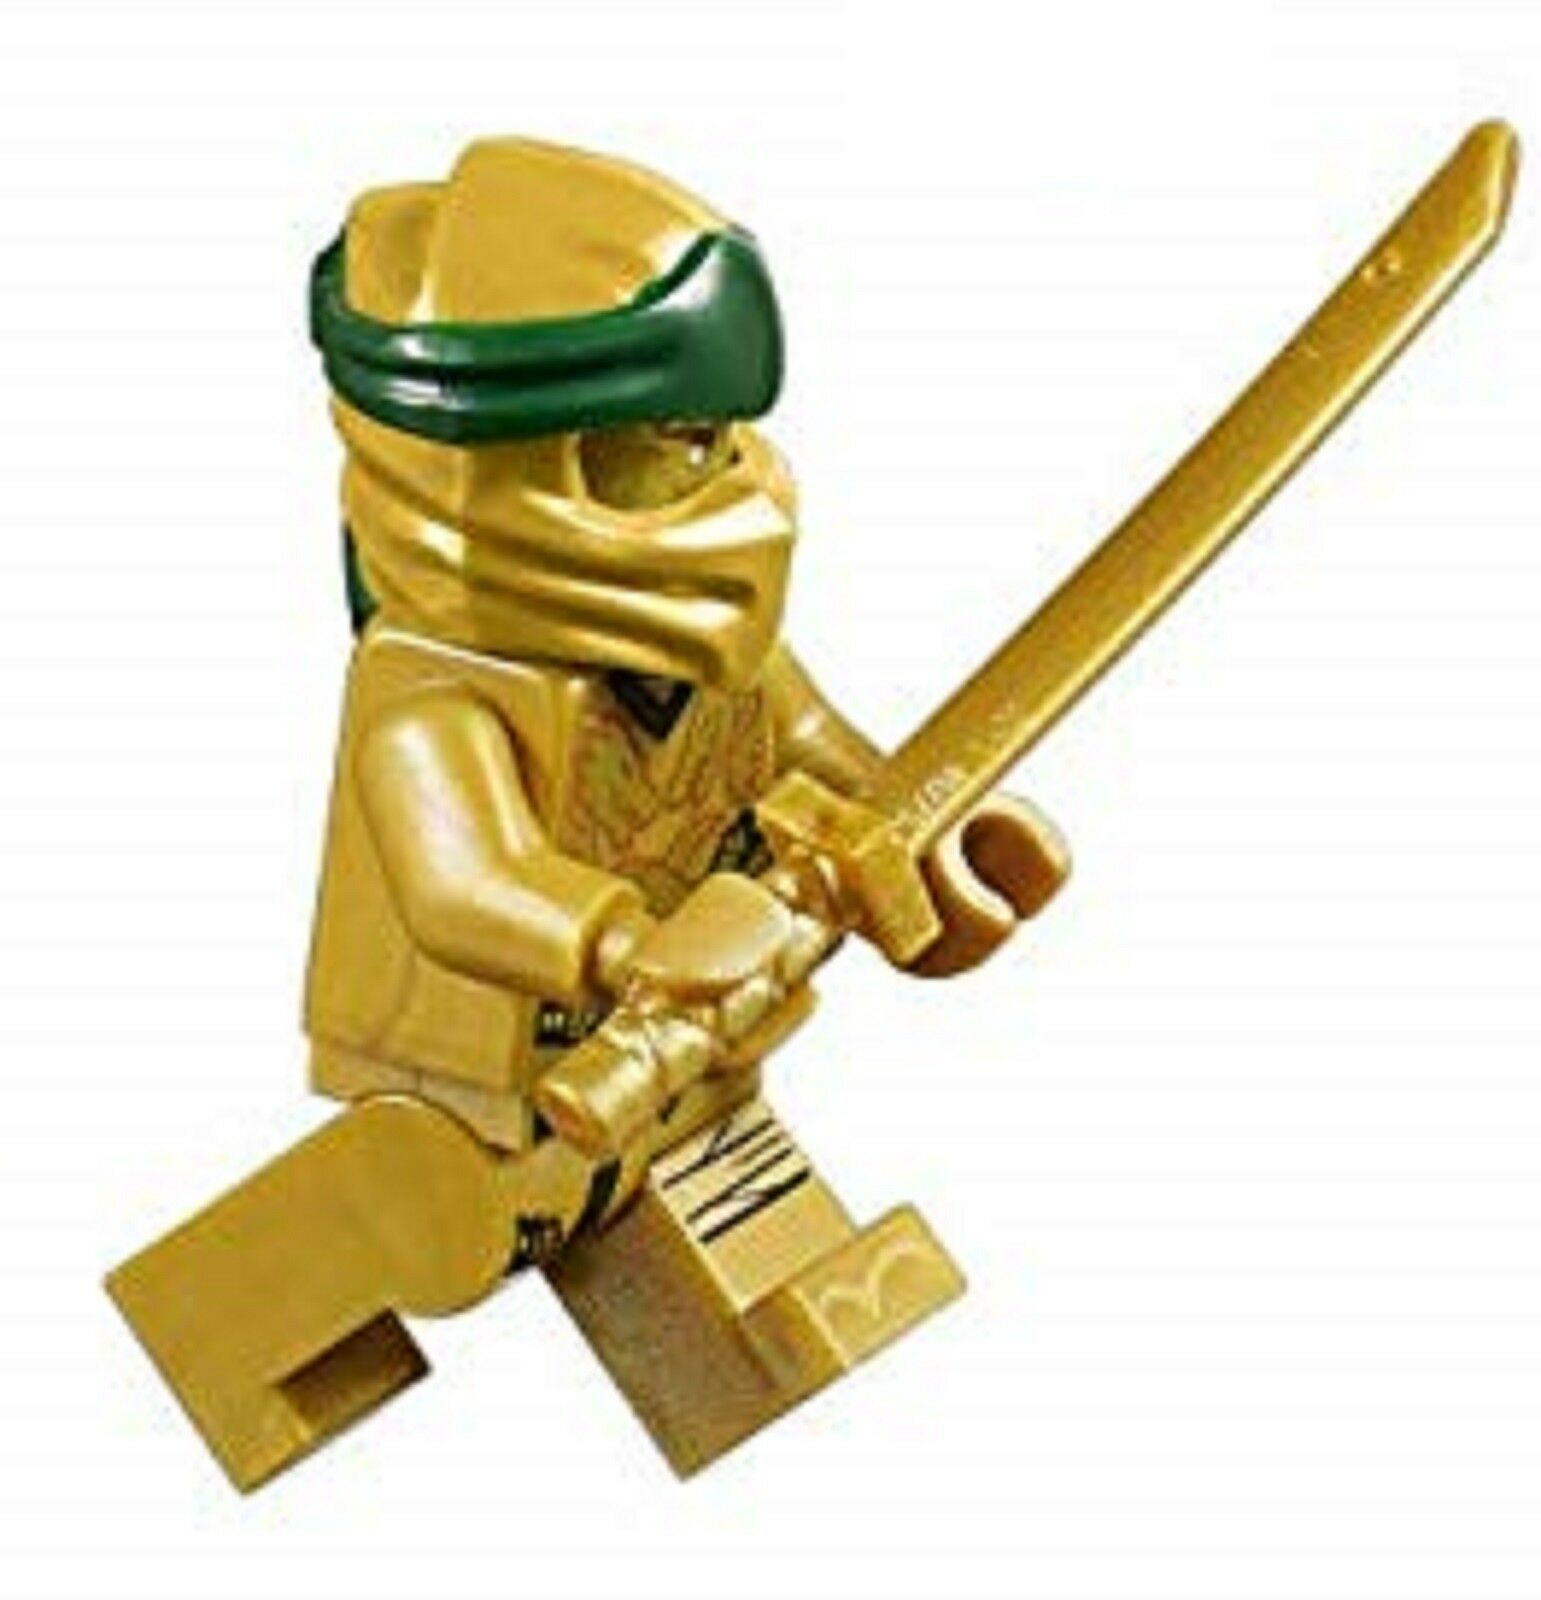 sword katana 70666 authentic LEGO Ninjago Golden Ninja Lloyd minifigure